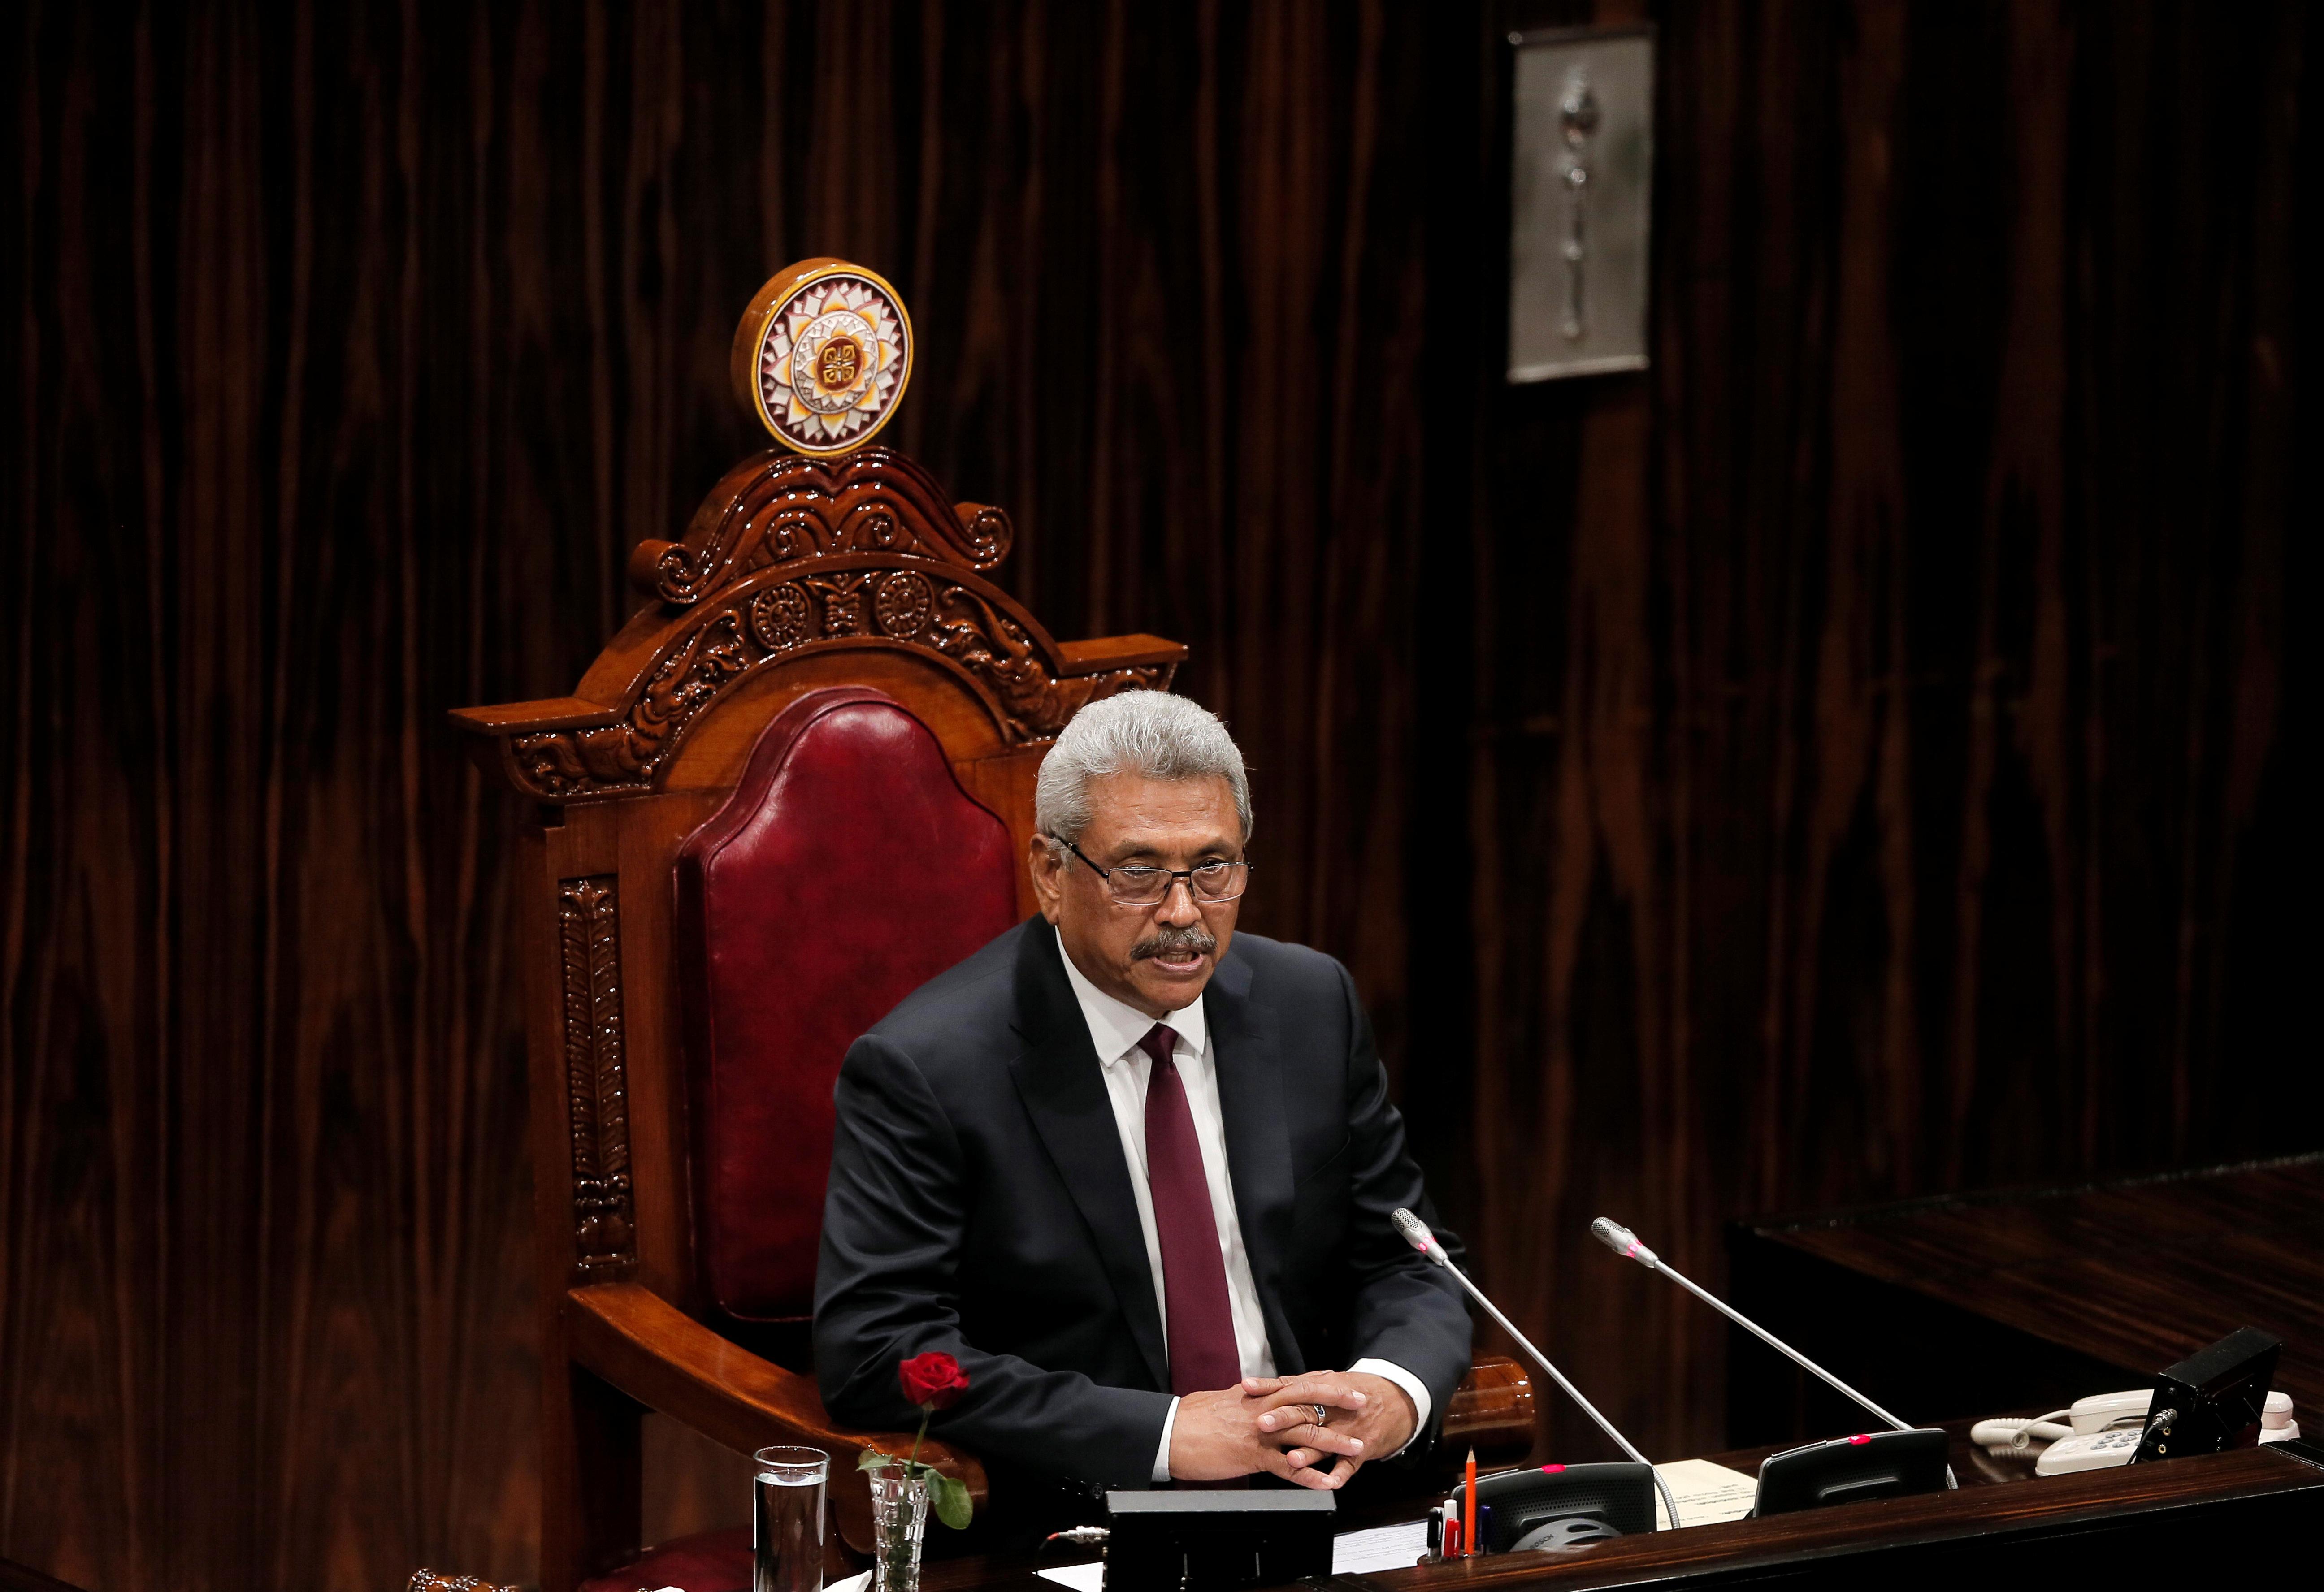 Sri Lanka announces lockdown as coronavirus cases surge; president to address nation